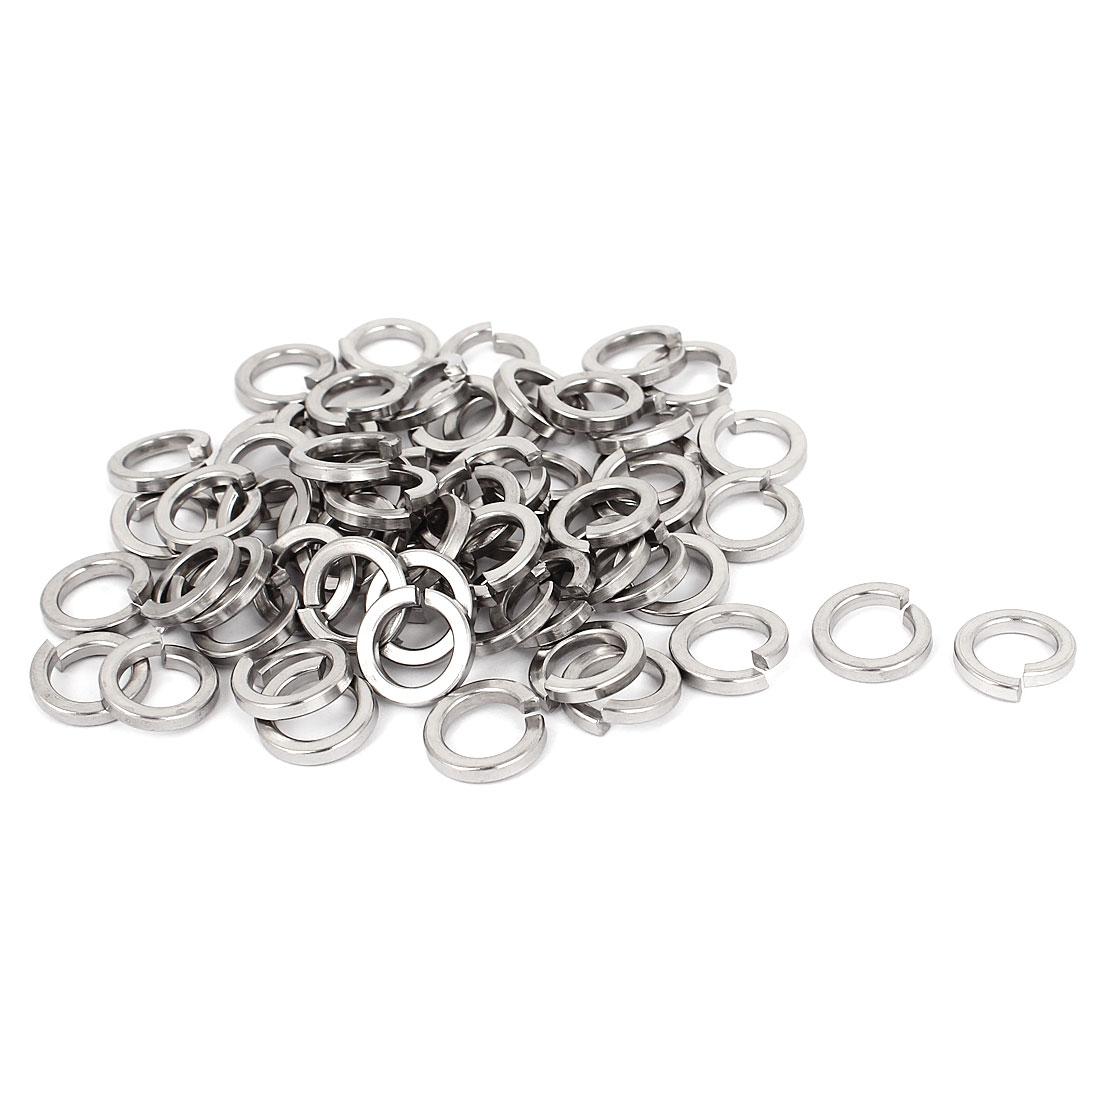 "100pcs 304 Stainless Steel Split Lock Spring Washers 3/8"" Screw Spacer Pad"